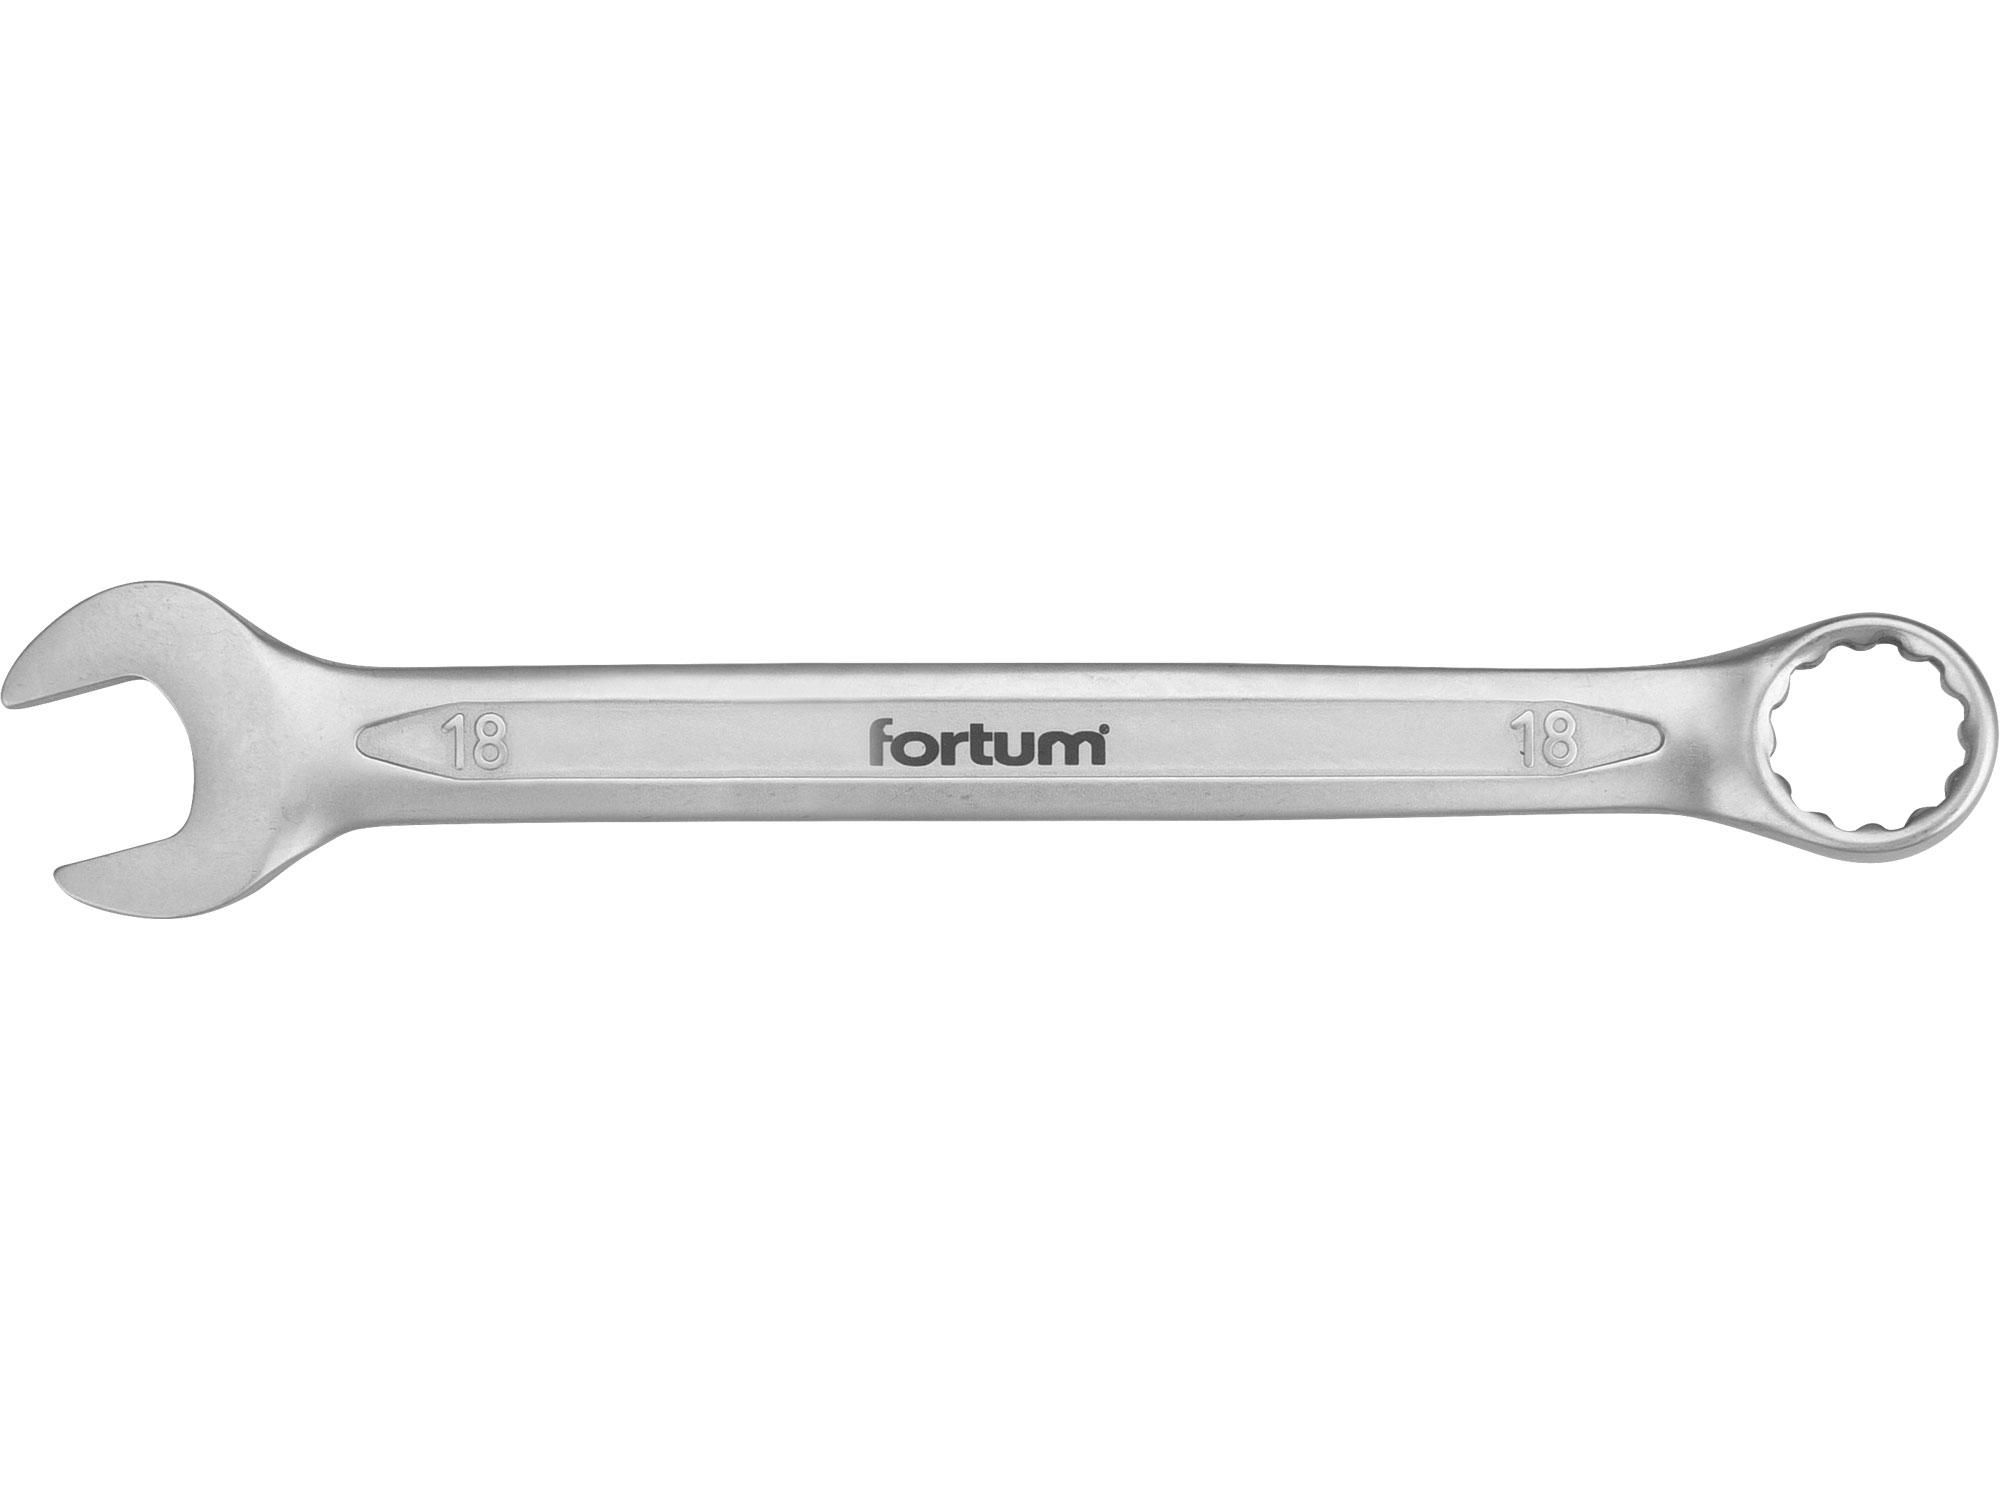 klíč očkoplochý, 18mm, L 231mm, FORTUM 4730218